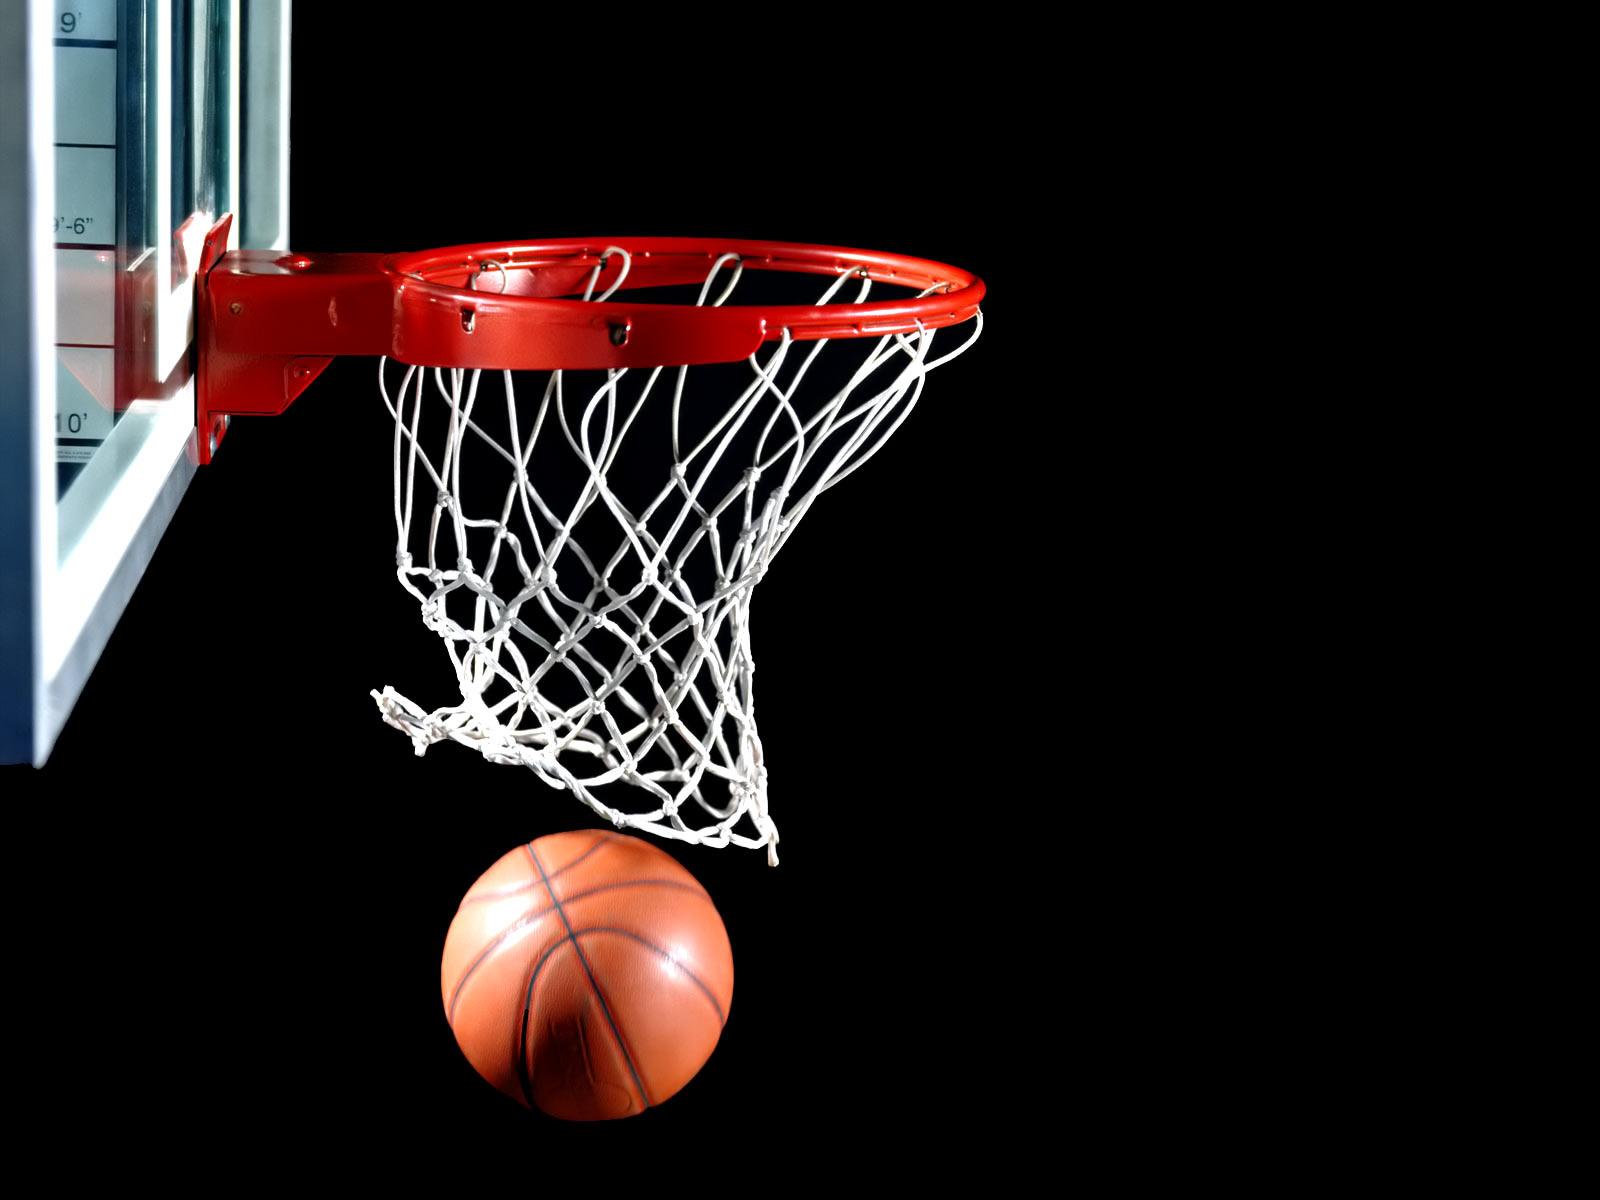 4f5218fc32ba8304a8dc_Basketball_Hoops.jpg